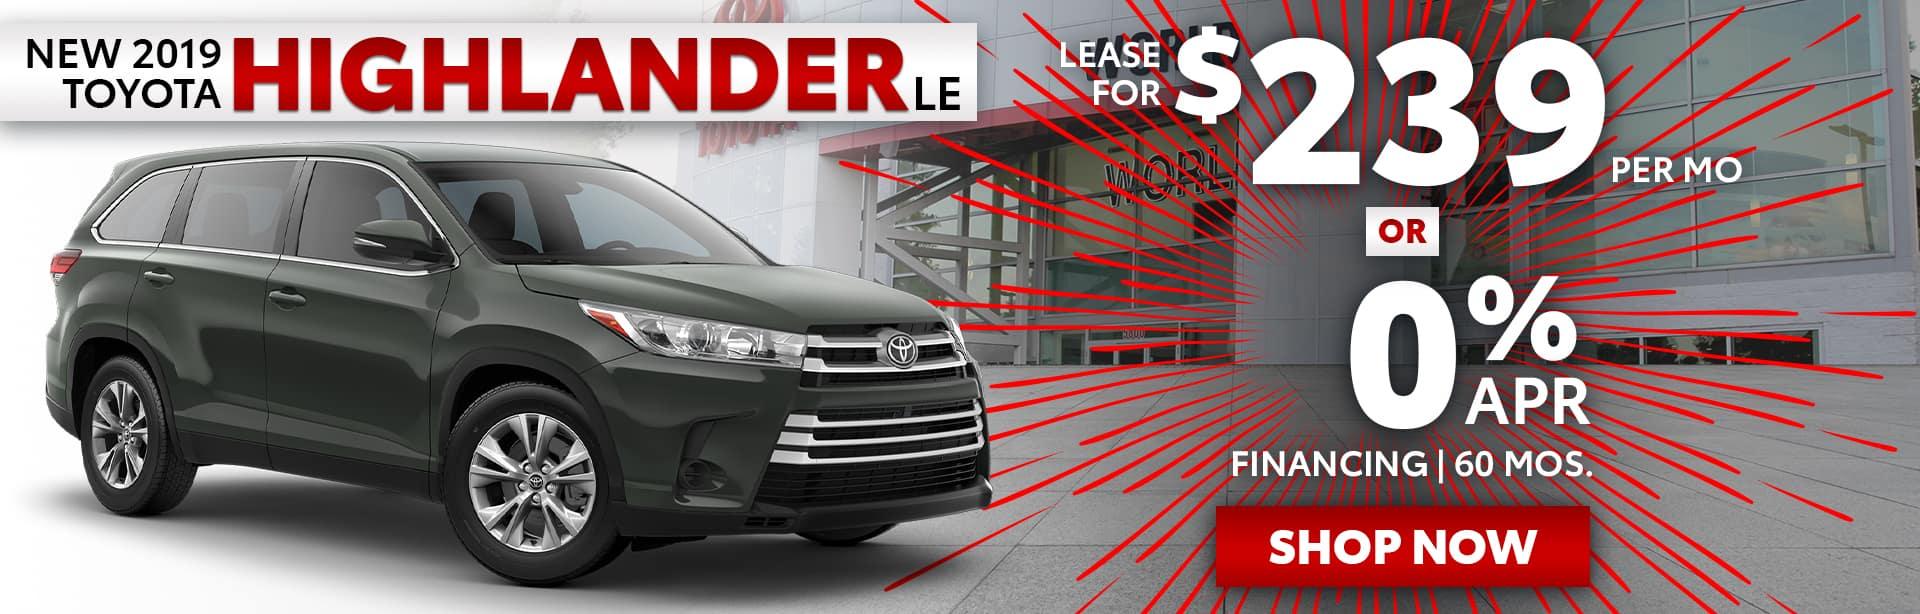 Used Car Dealerships In Atlanta Ga >> Welcome To World Toyota Toyota Dealership In Atlanta Ga